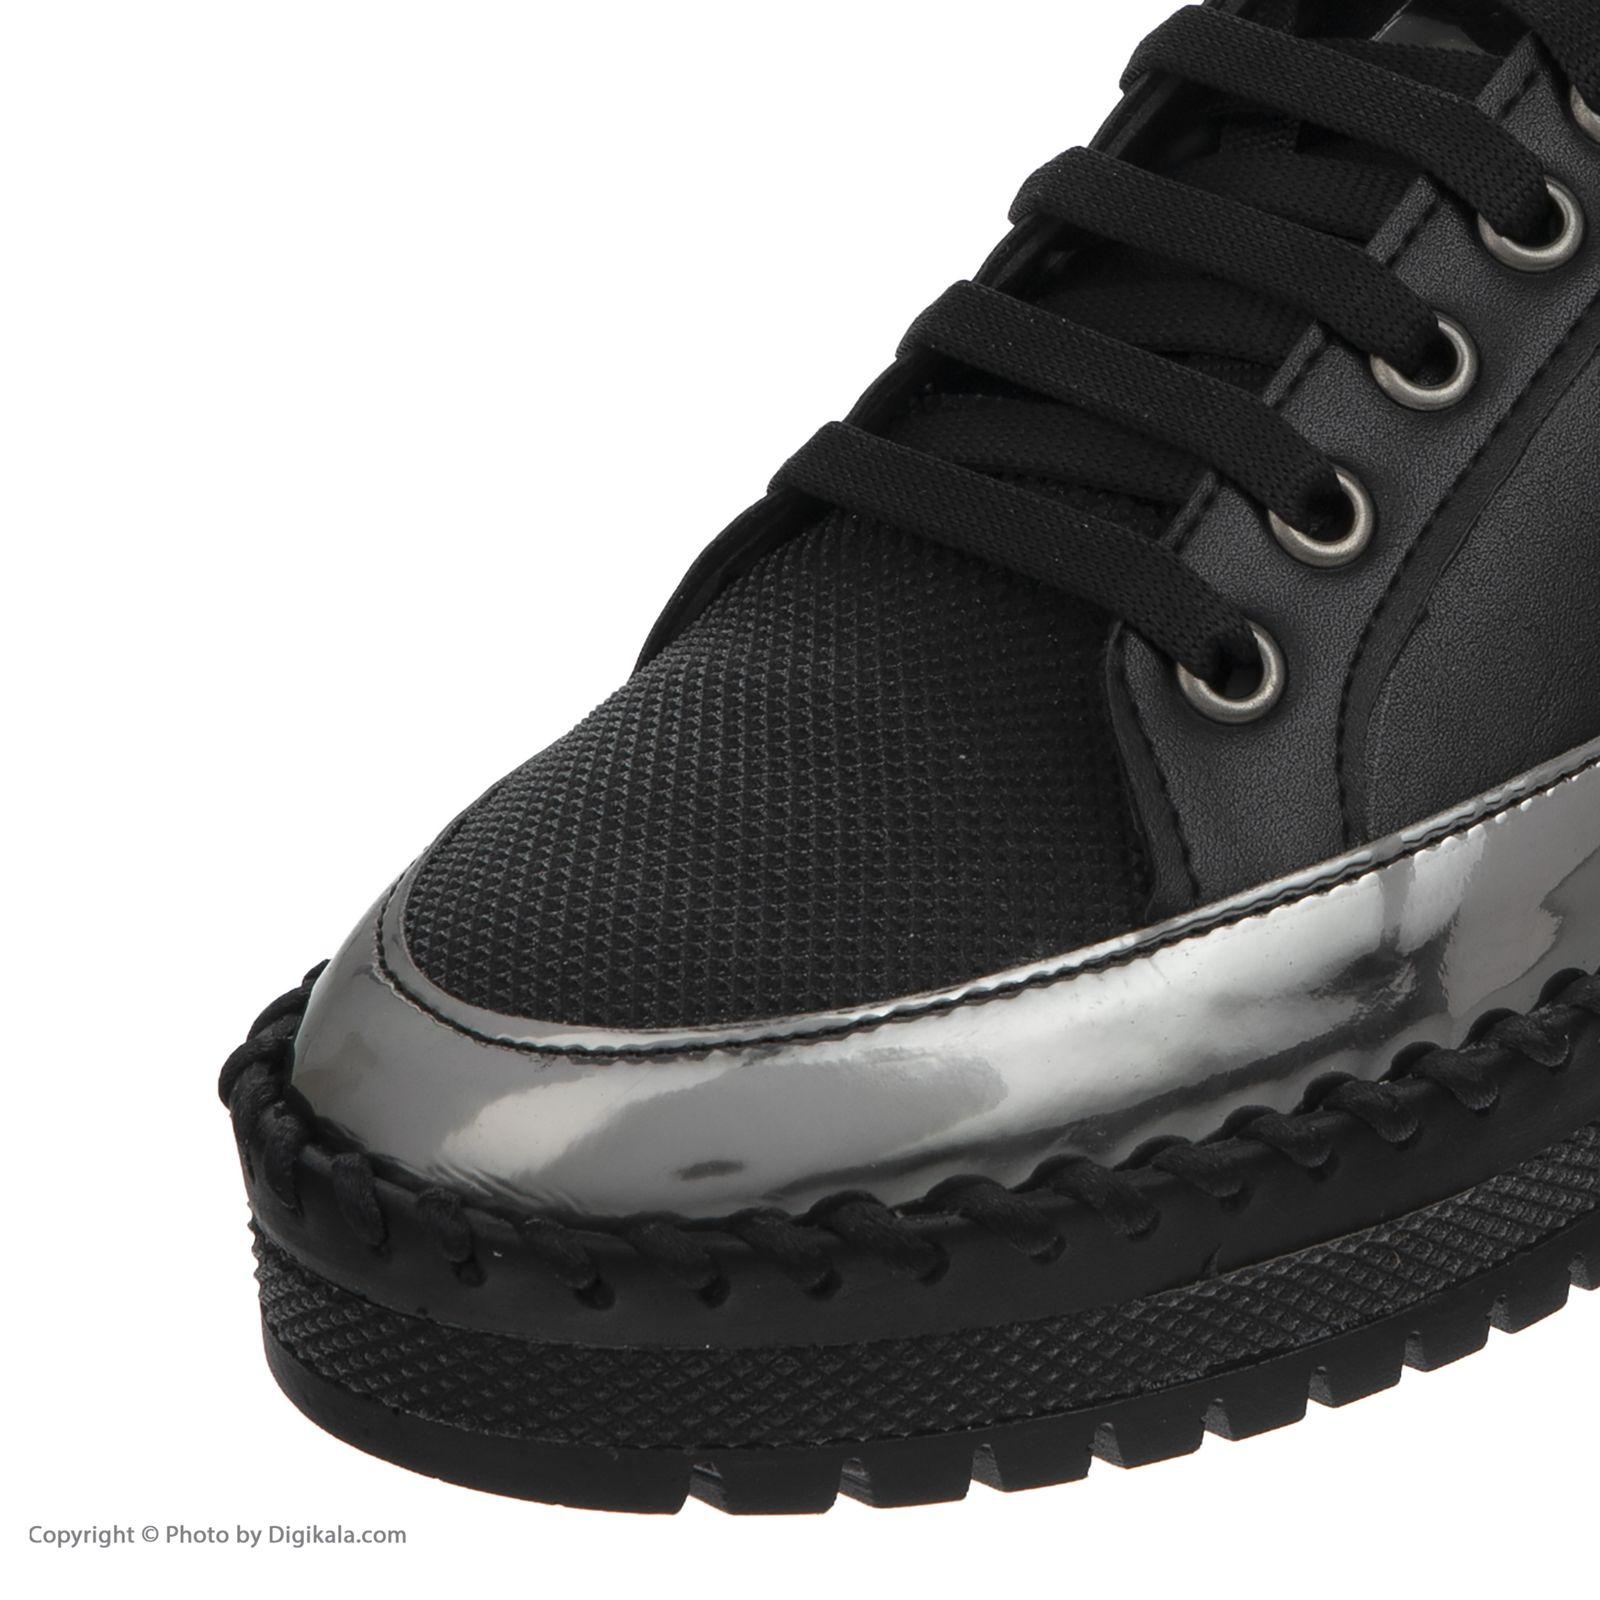 کفش روزمره زنانه ام تو مدل 99-1005 main 1 6